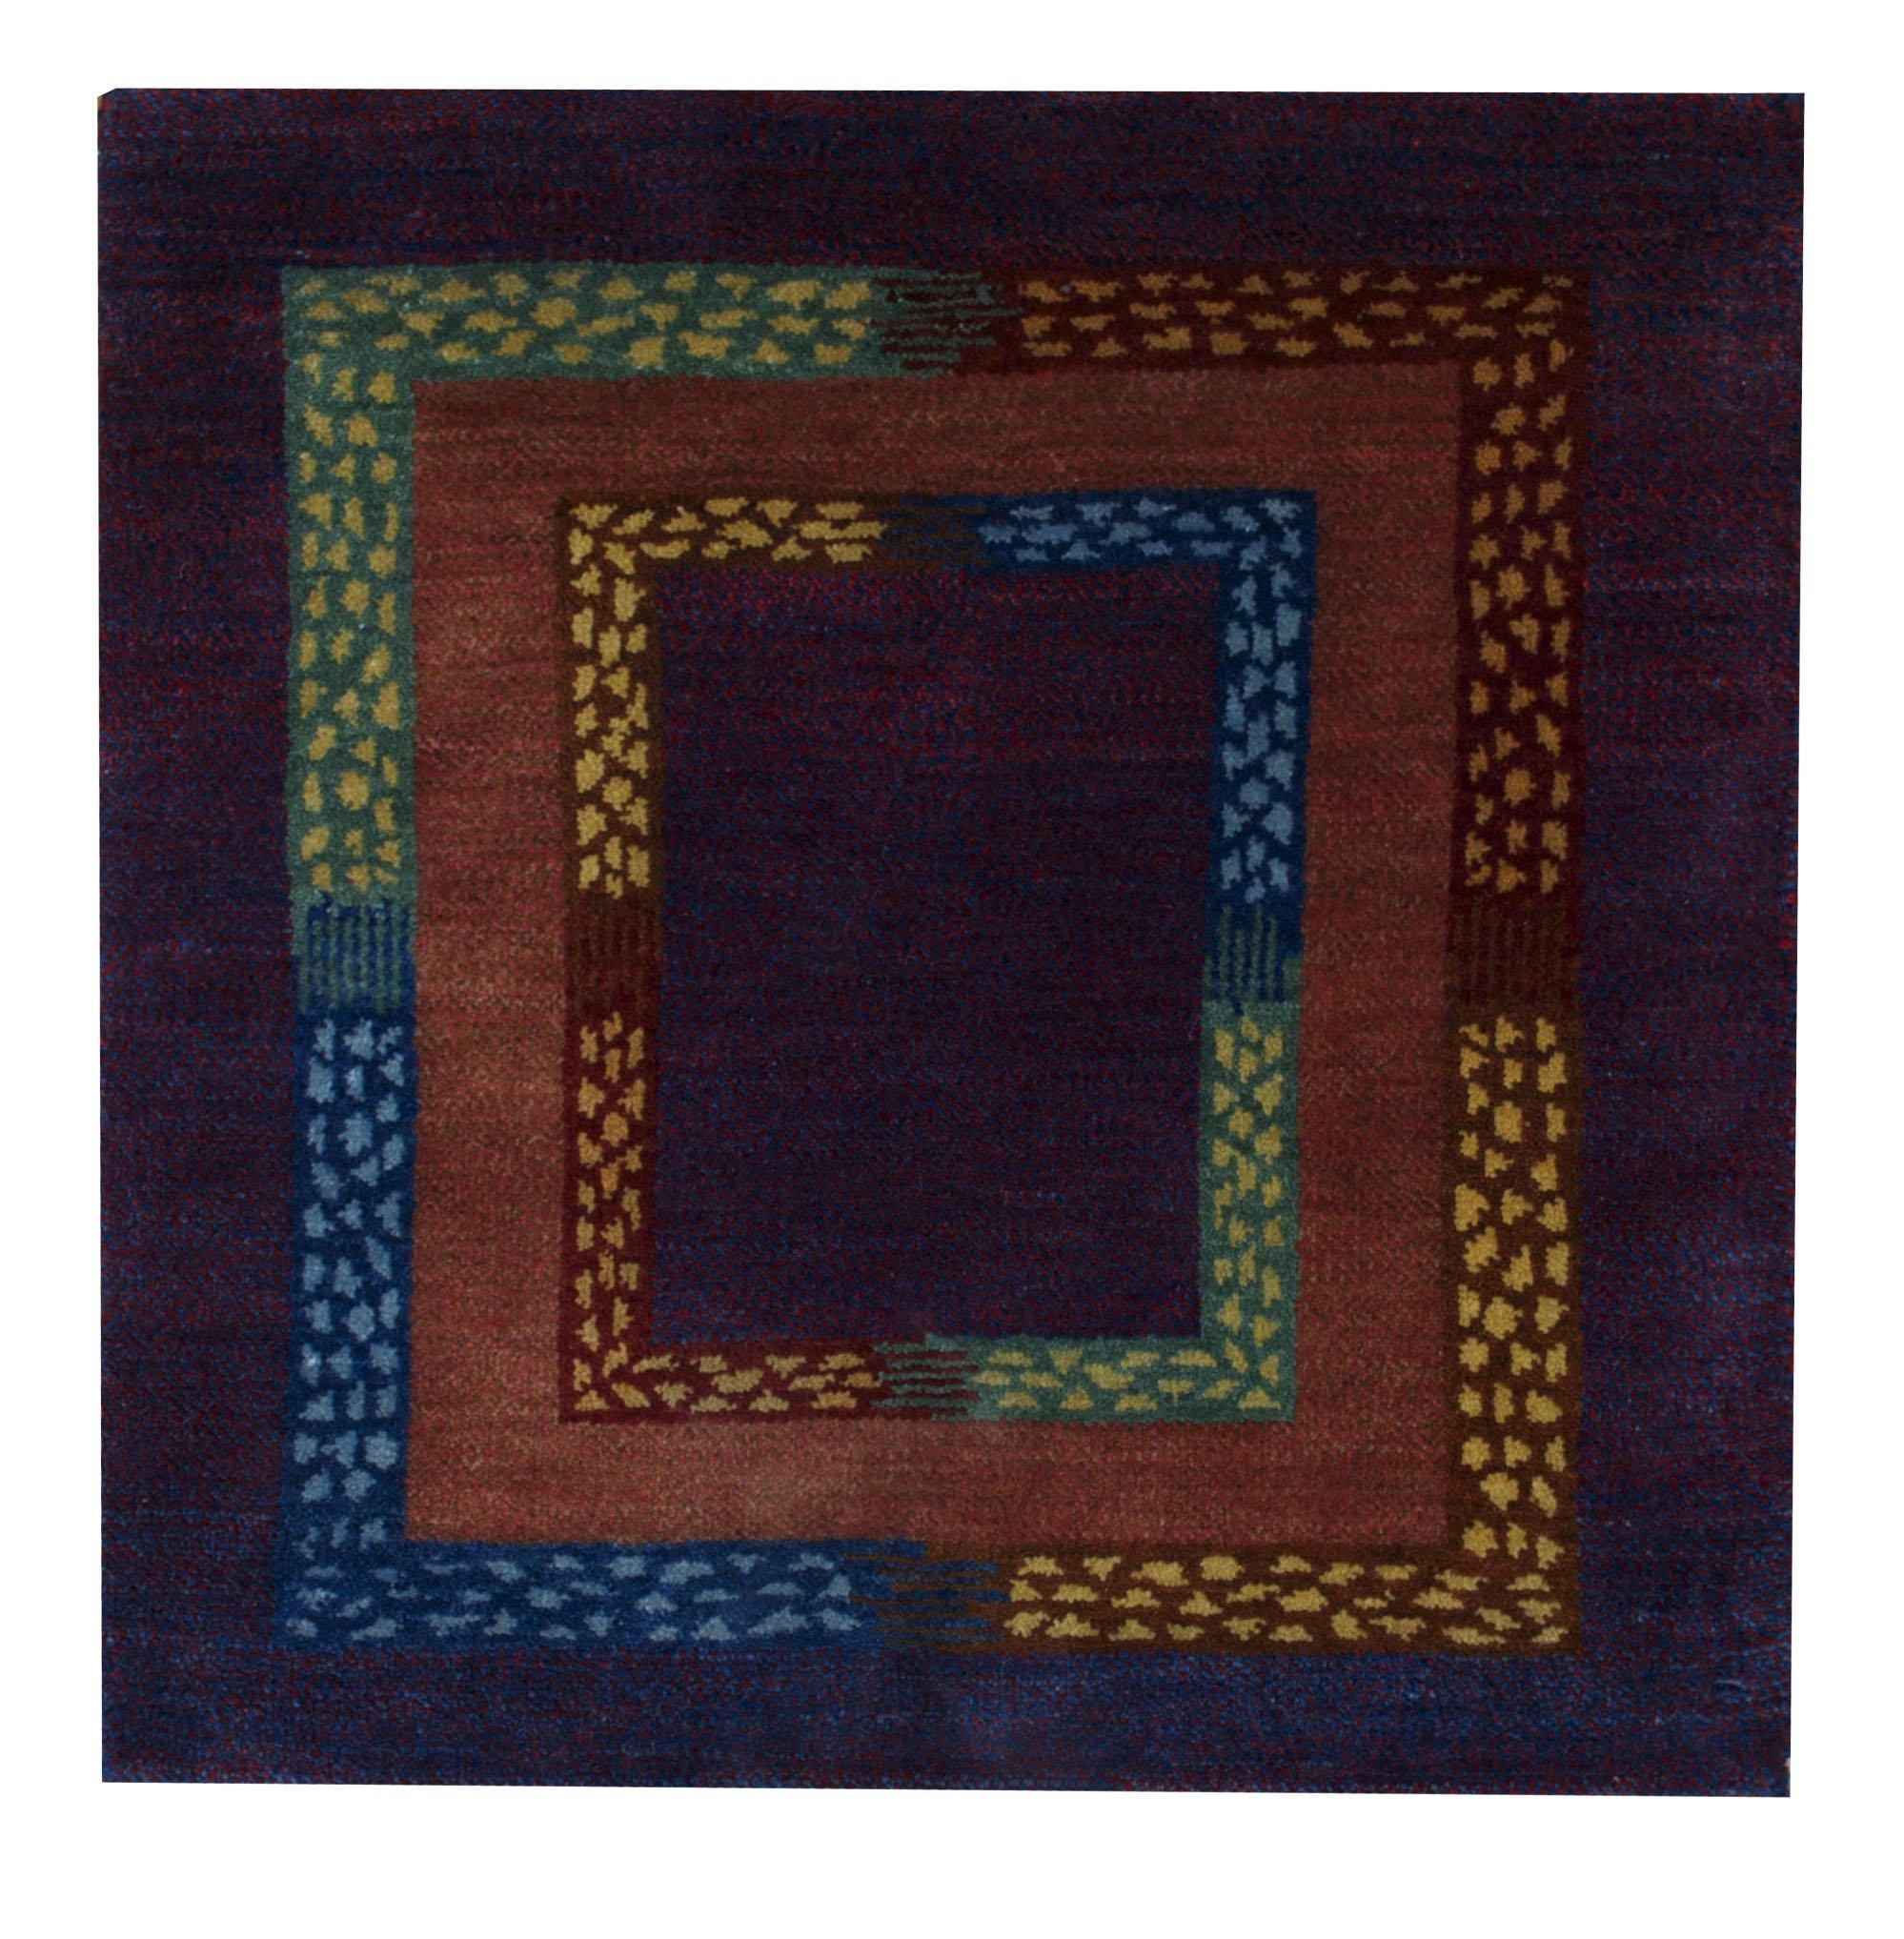 Gabbeh 2' x 2' Handmade Area Rug - Shabahang Royal Carpet